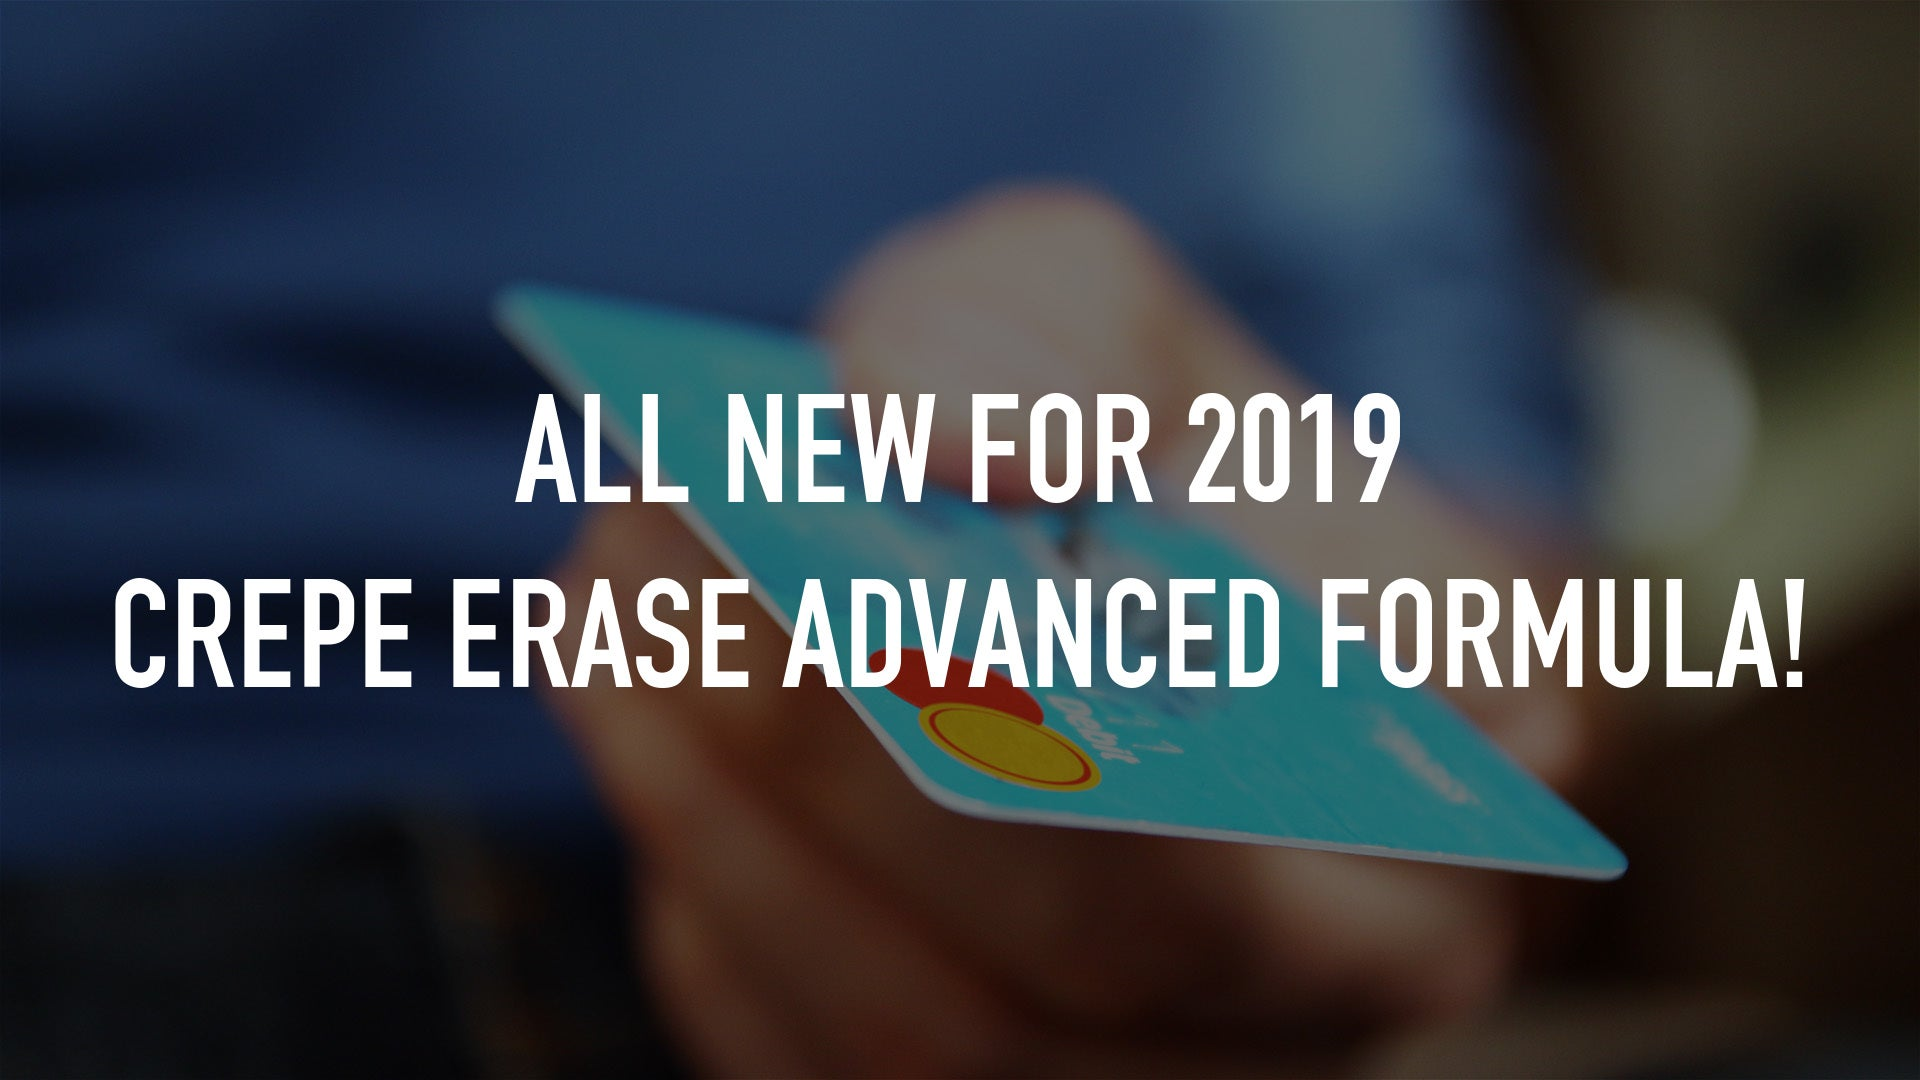 All NEW for 2019 Crepe Erase Advanced formula!